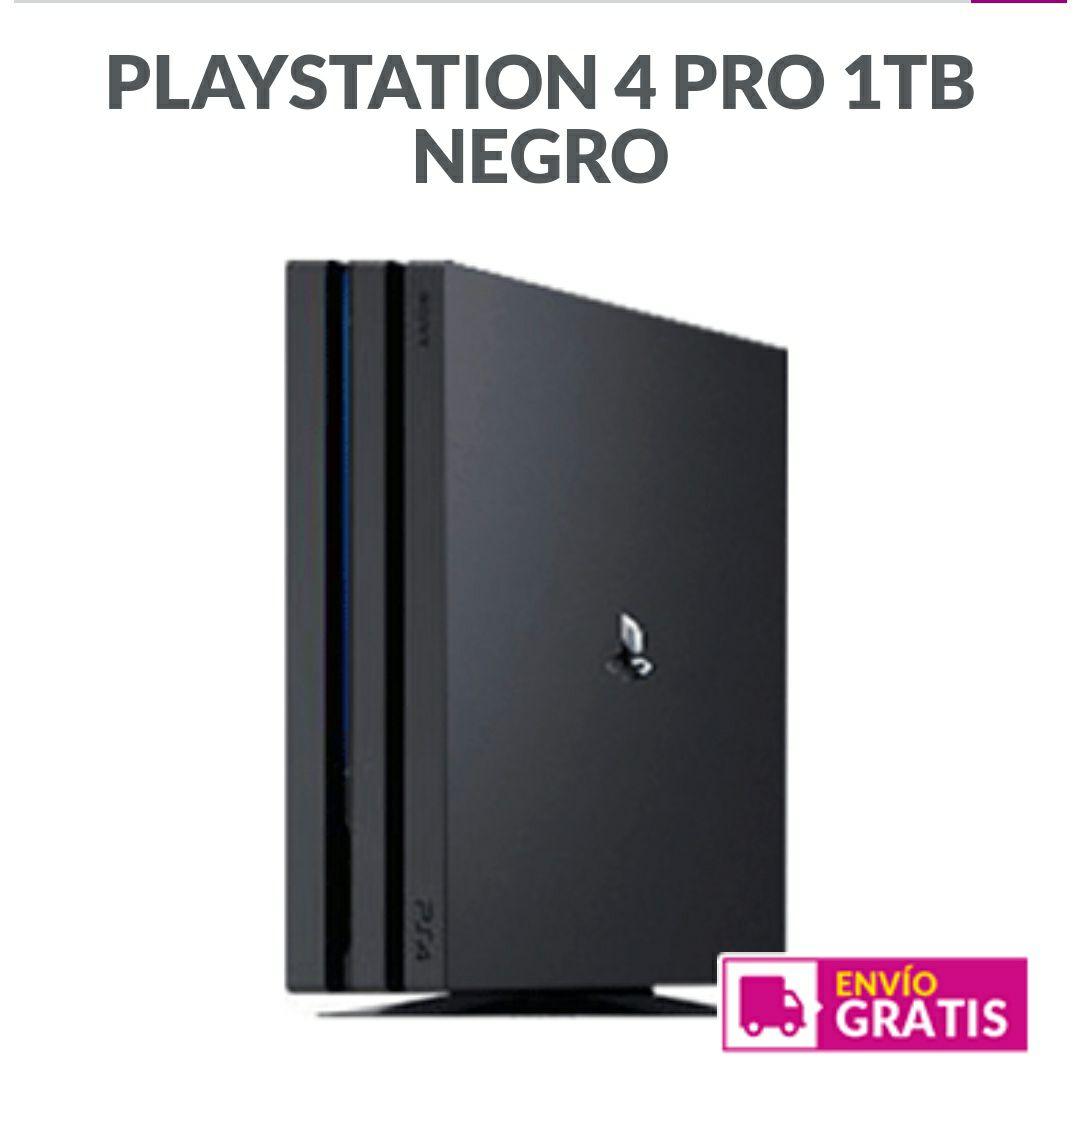 PS4 Pro 1TB (Seminueva)